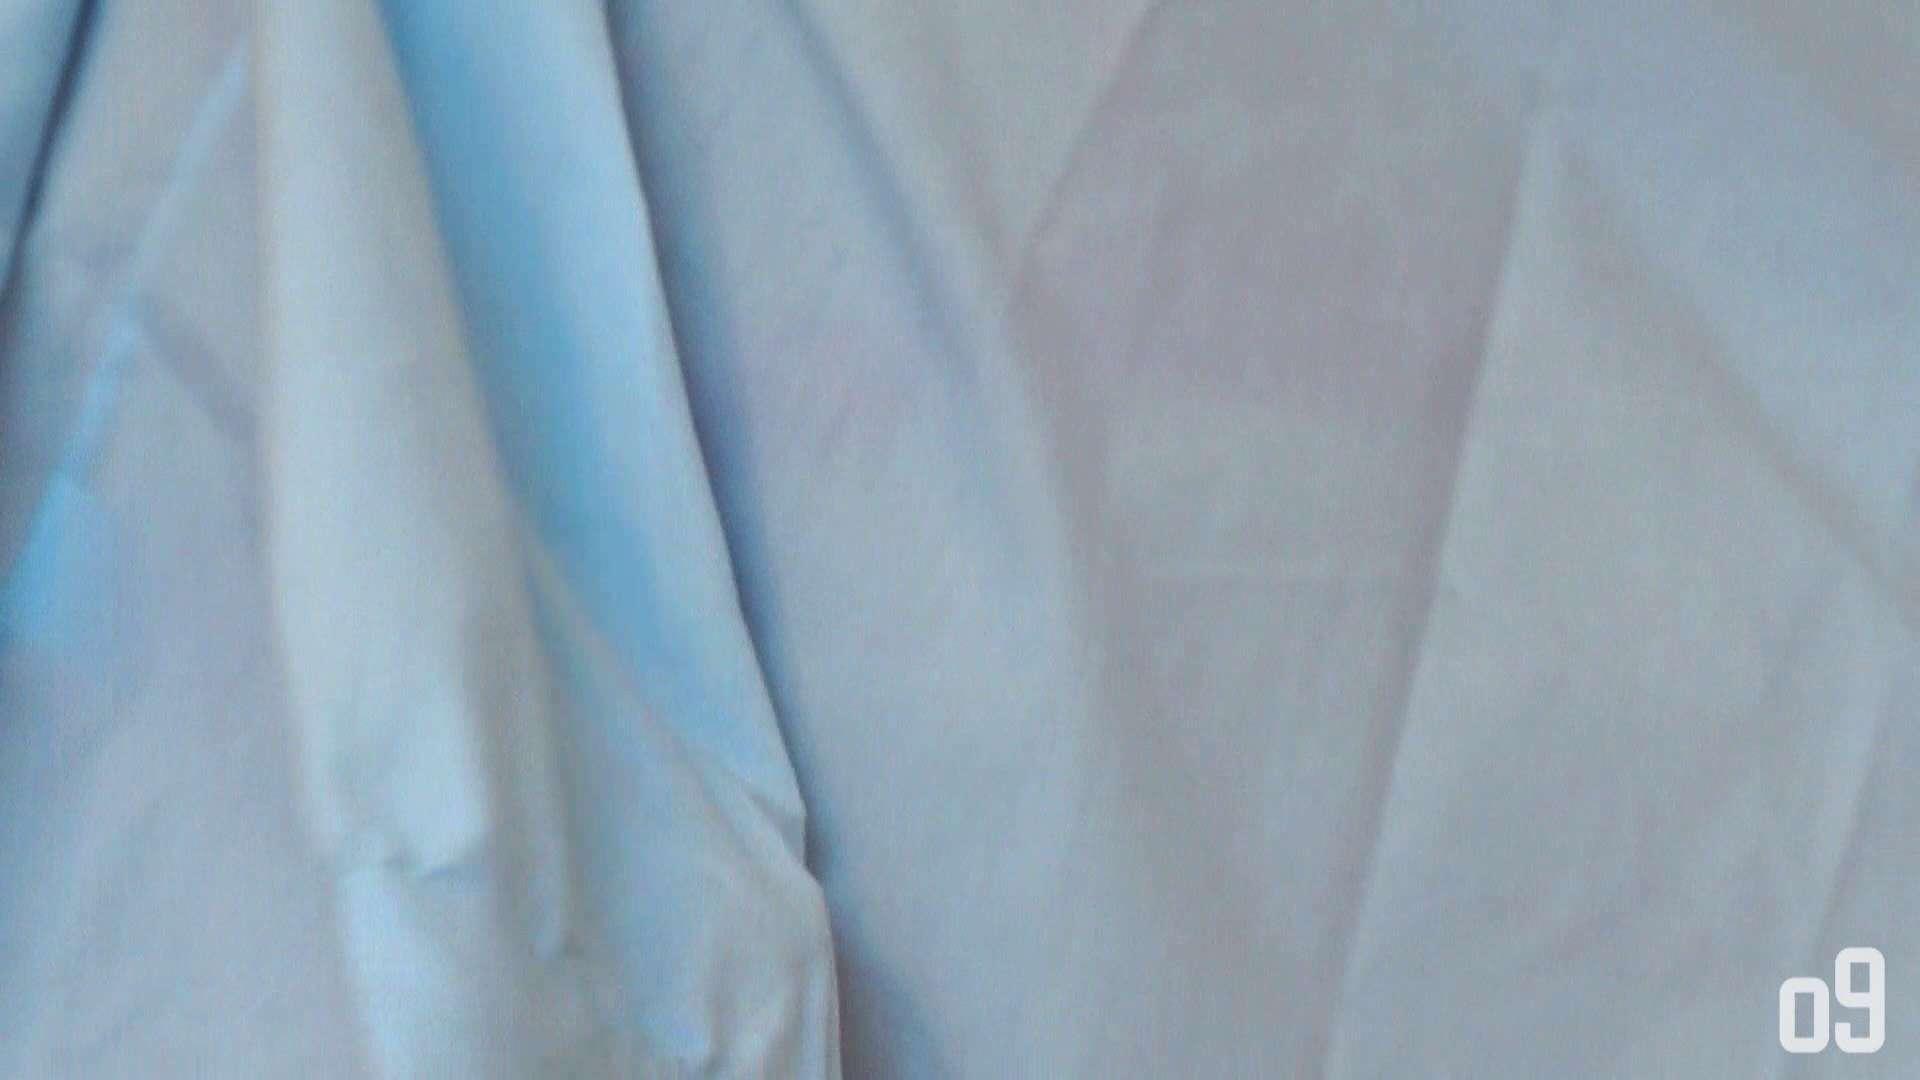 vol.2 制服に着替えてもらいました。 制服JK | 美女OL  97連発 52